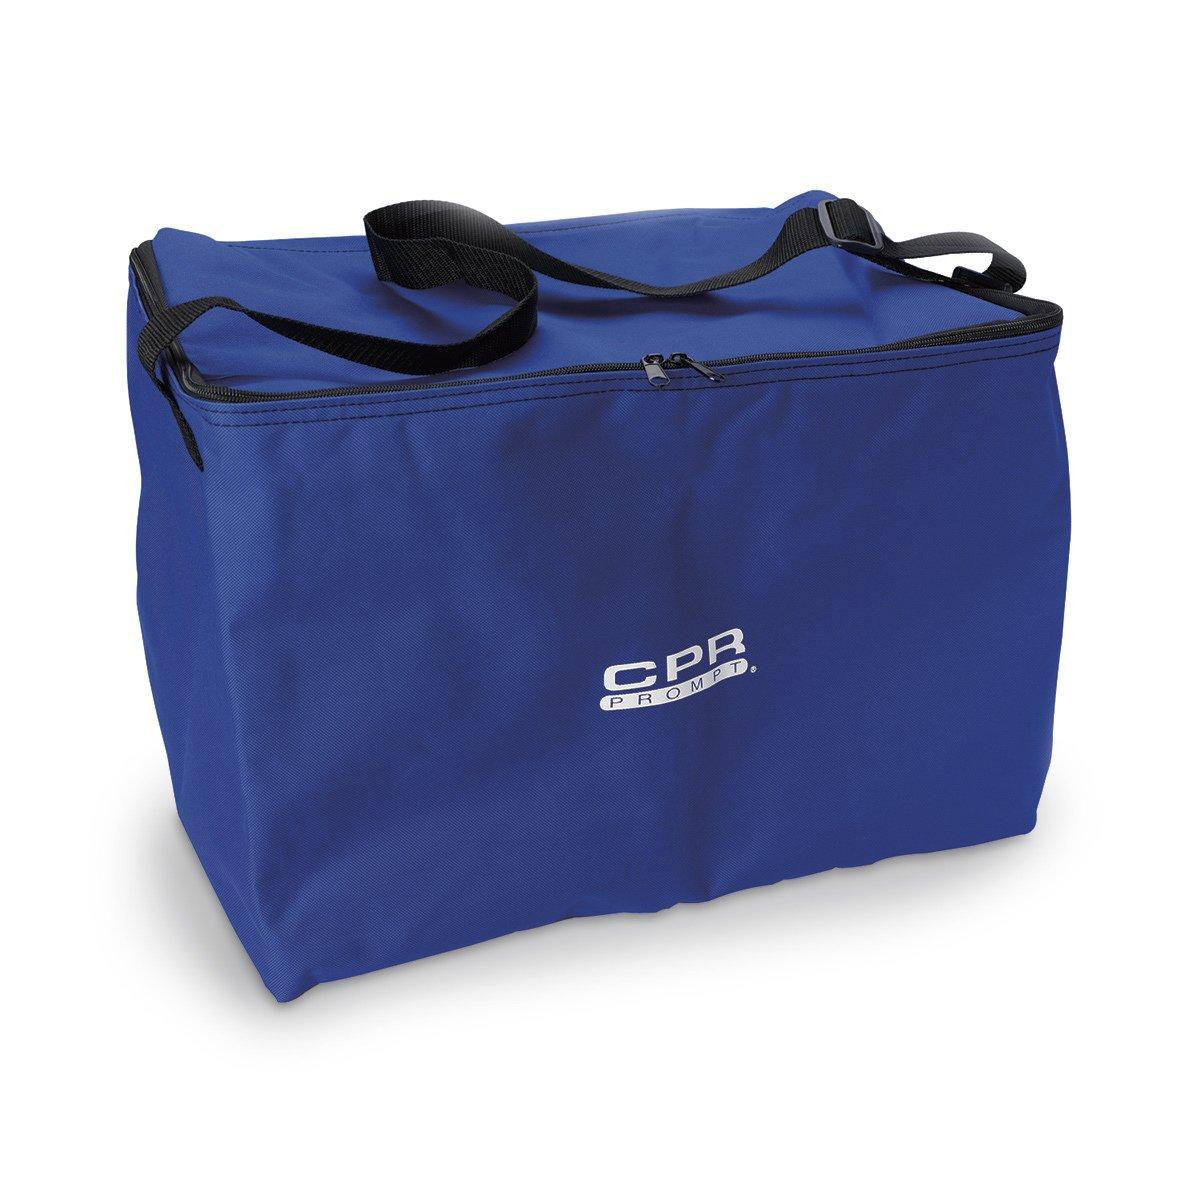 CPR Prompt (Blue) Small Nylon Manikin Carry Bag - LF06928U